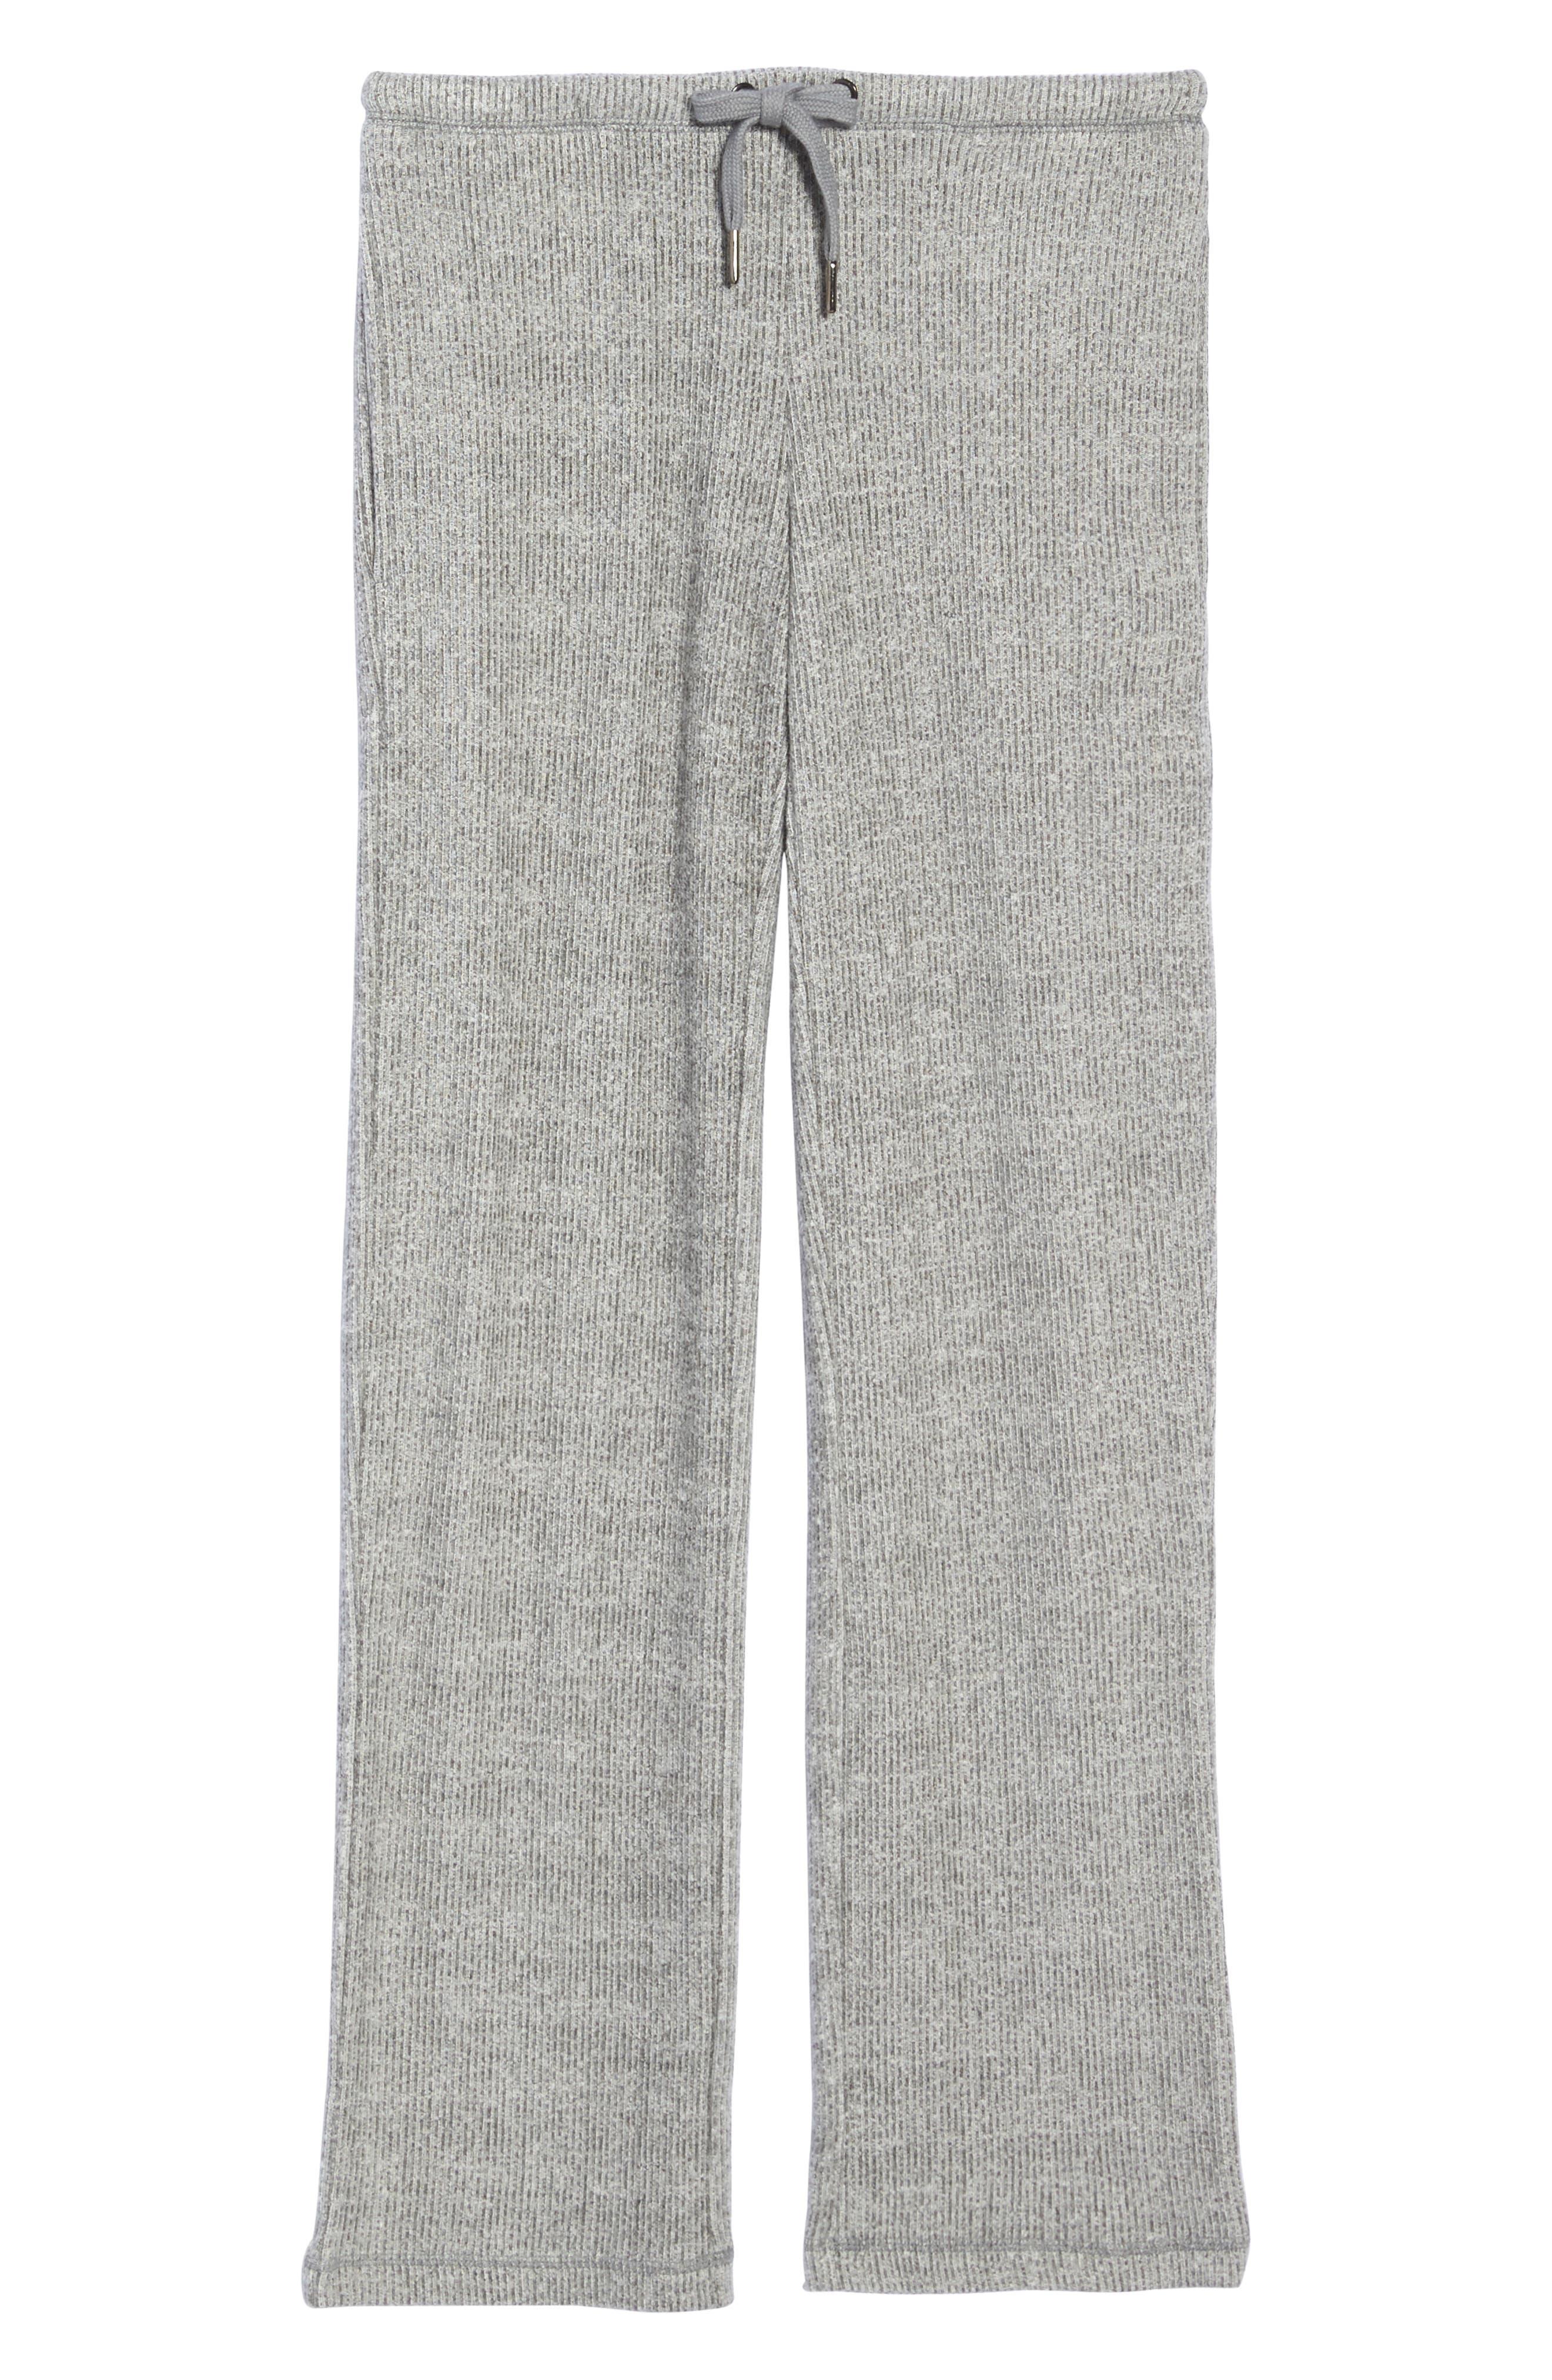 Knit Lounge Pants,                             Alternate thumbnail 6, color,                             020